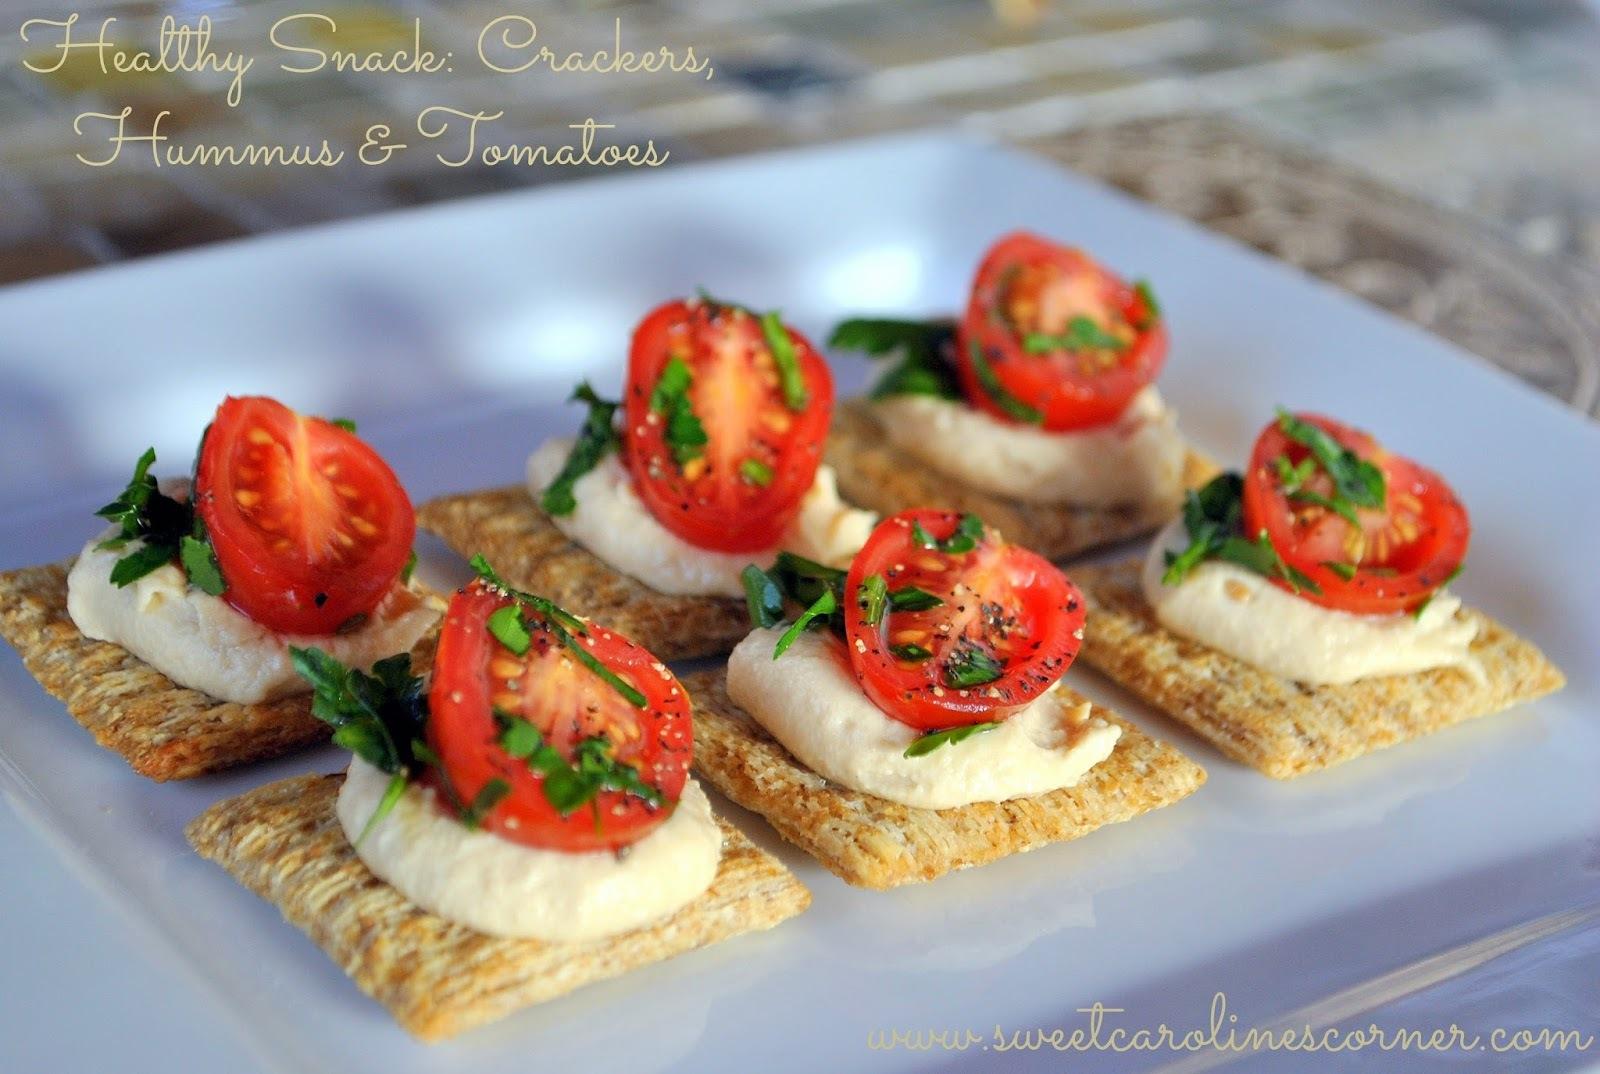 Healthy Snack: Crackers, Hummus & Tomatoes (Lanchinho Saudável: Bolacha Integral, Hummus & Tomates)